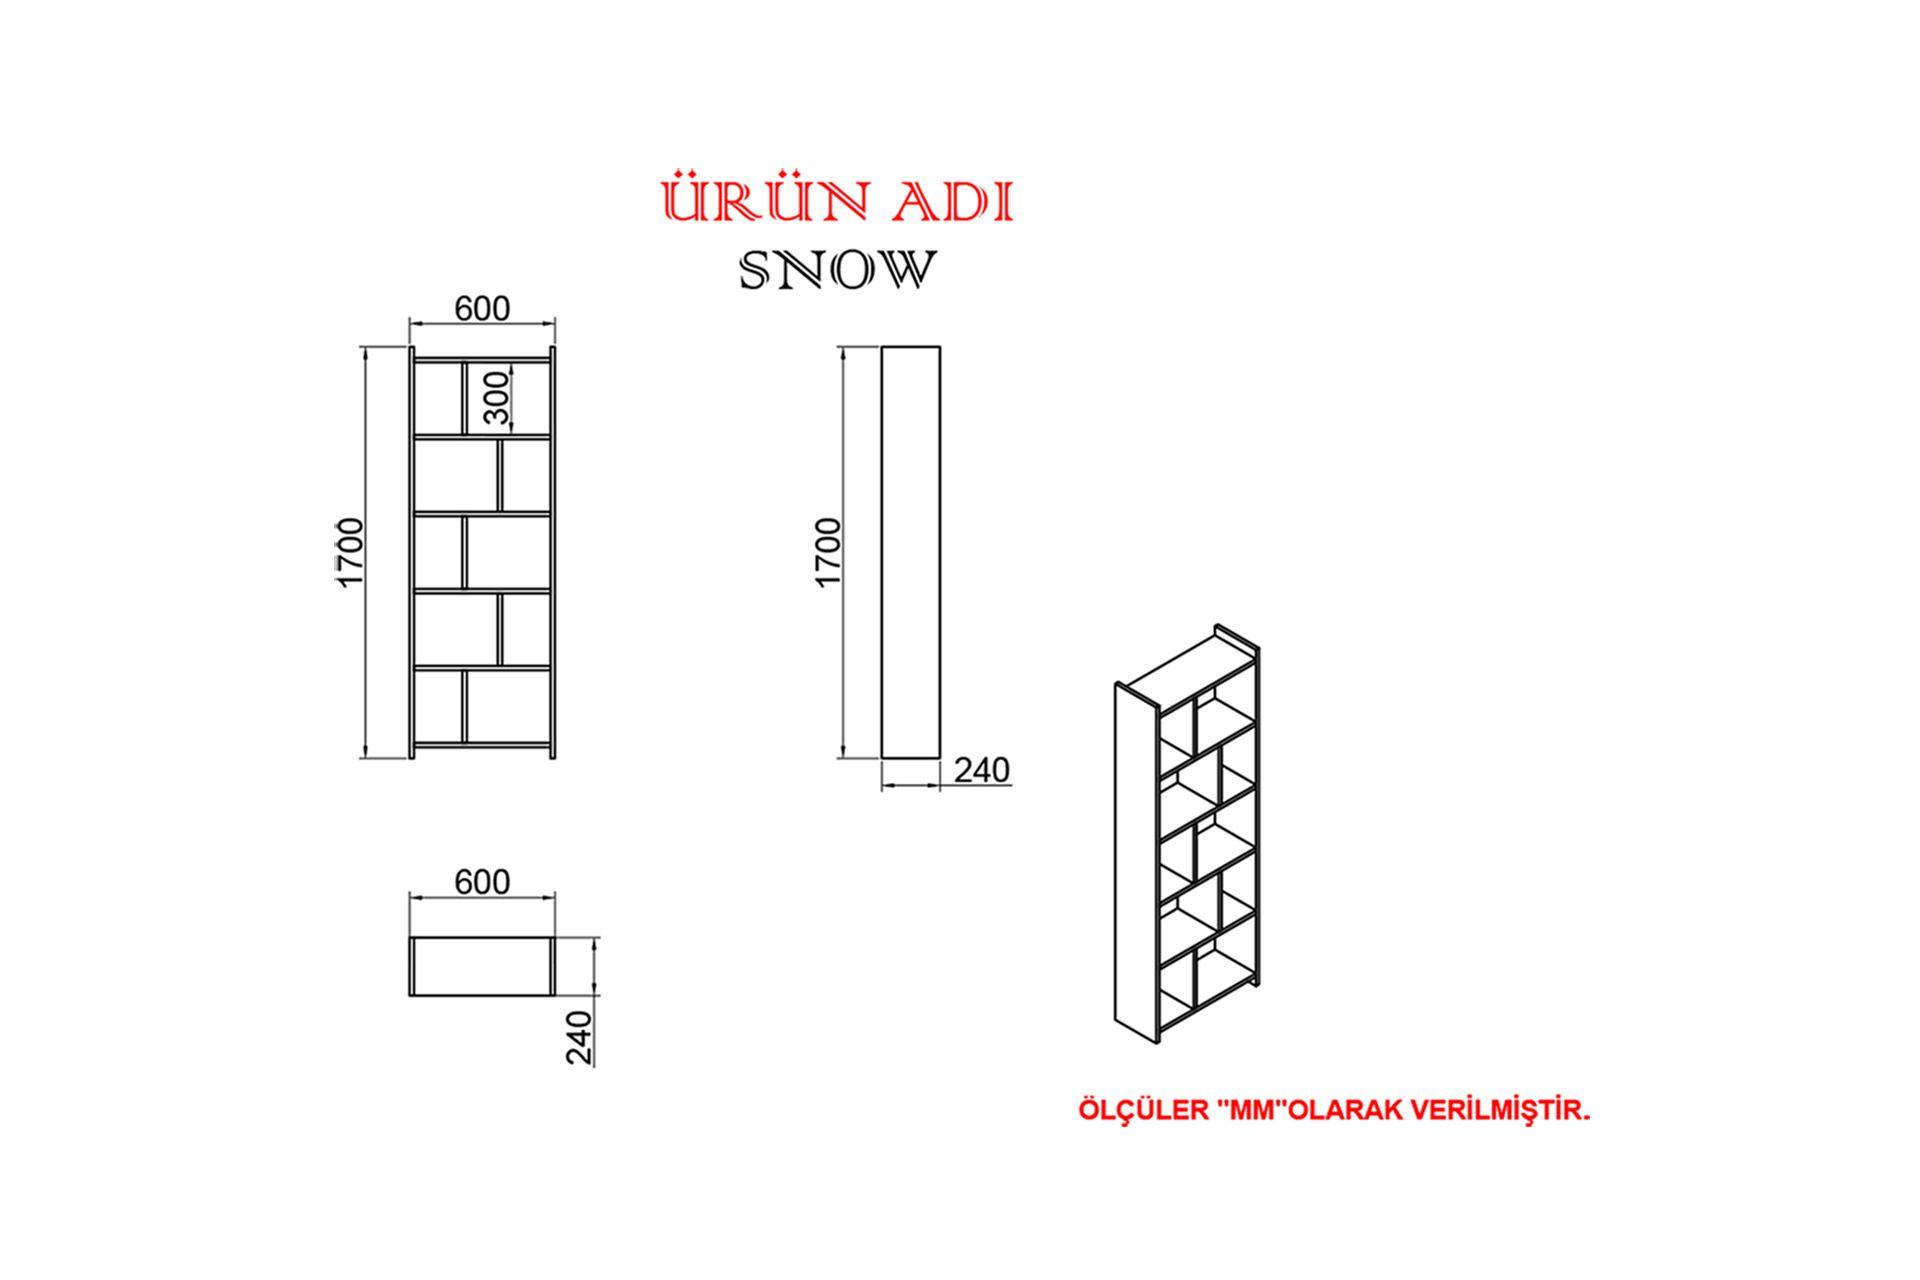 KALENDER DEKOR AVEL-TWİNS SNOW 145 CM ÇALIŞMA MASASI TAKIMI AVTS05